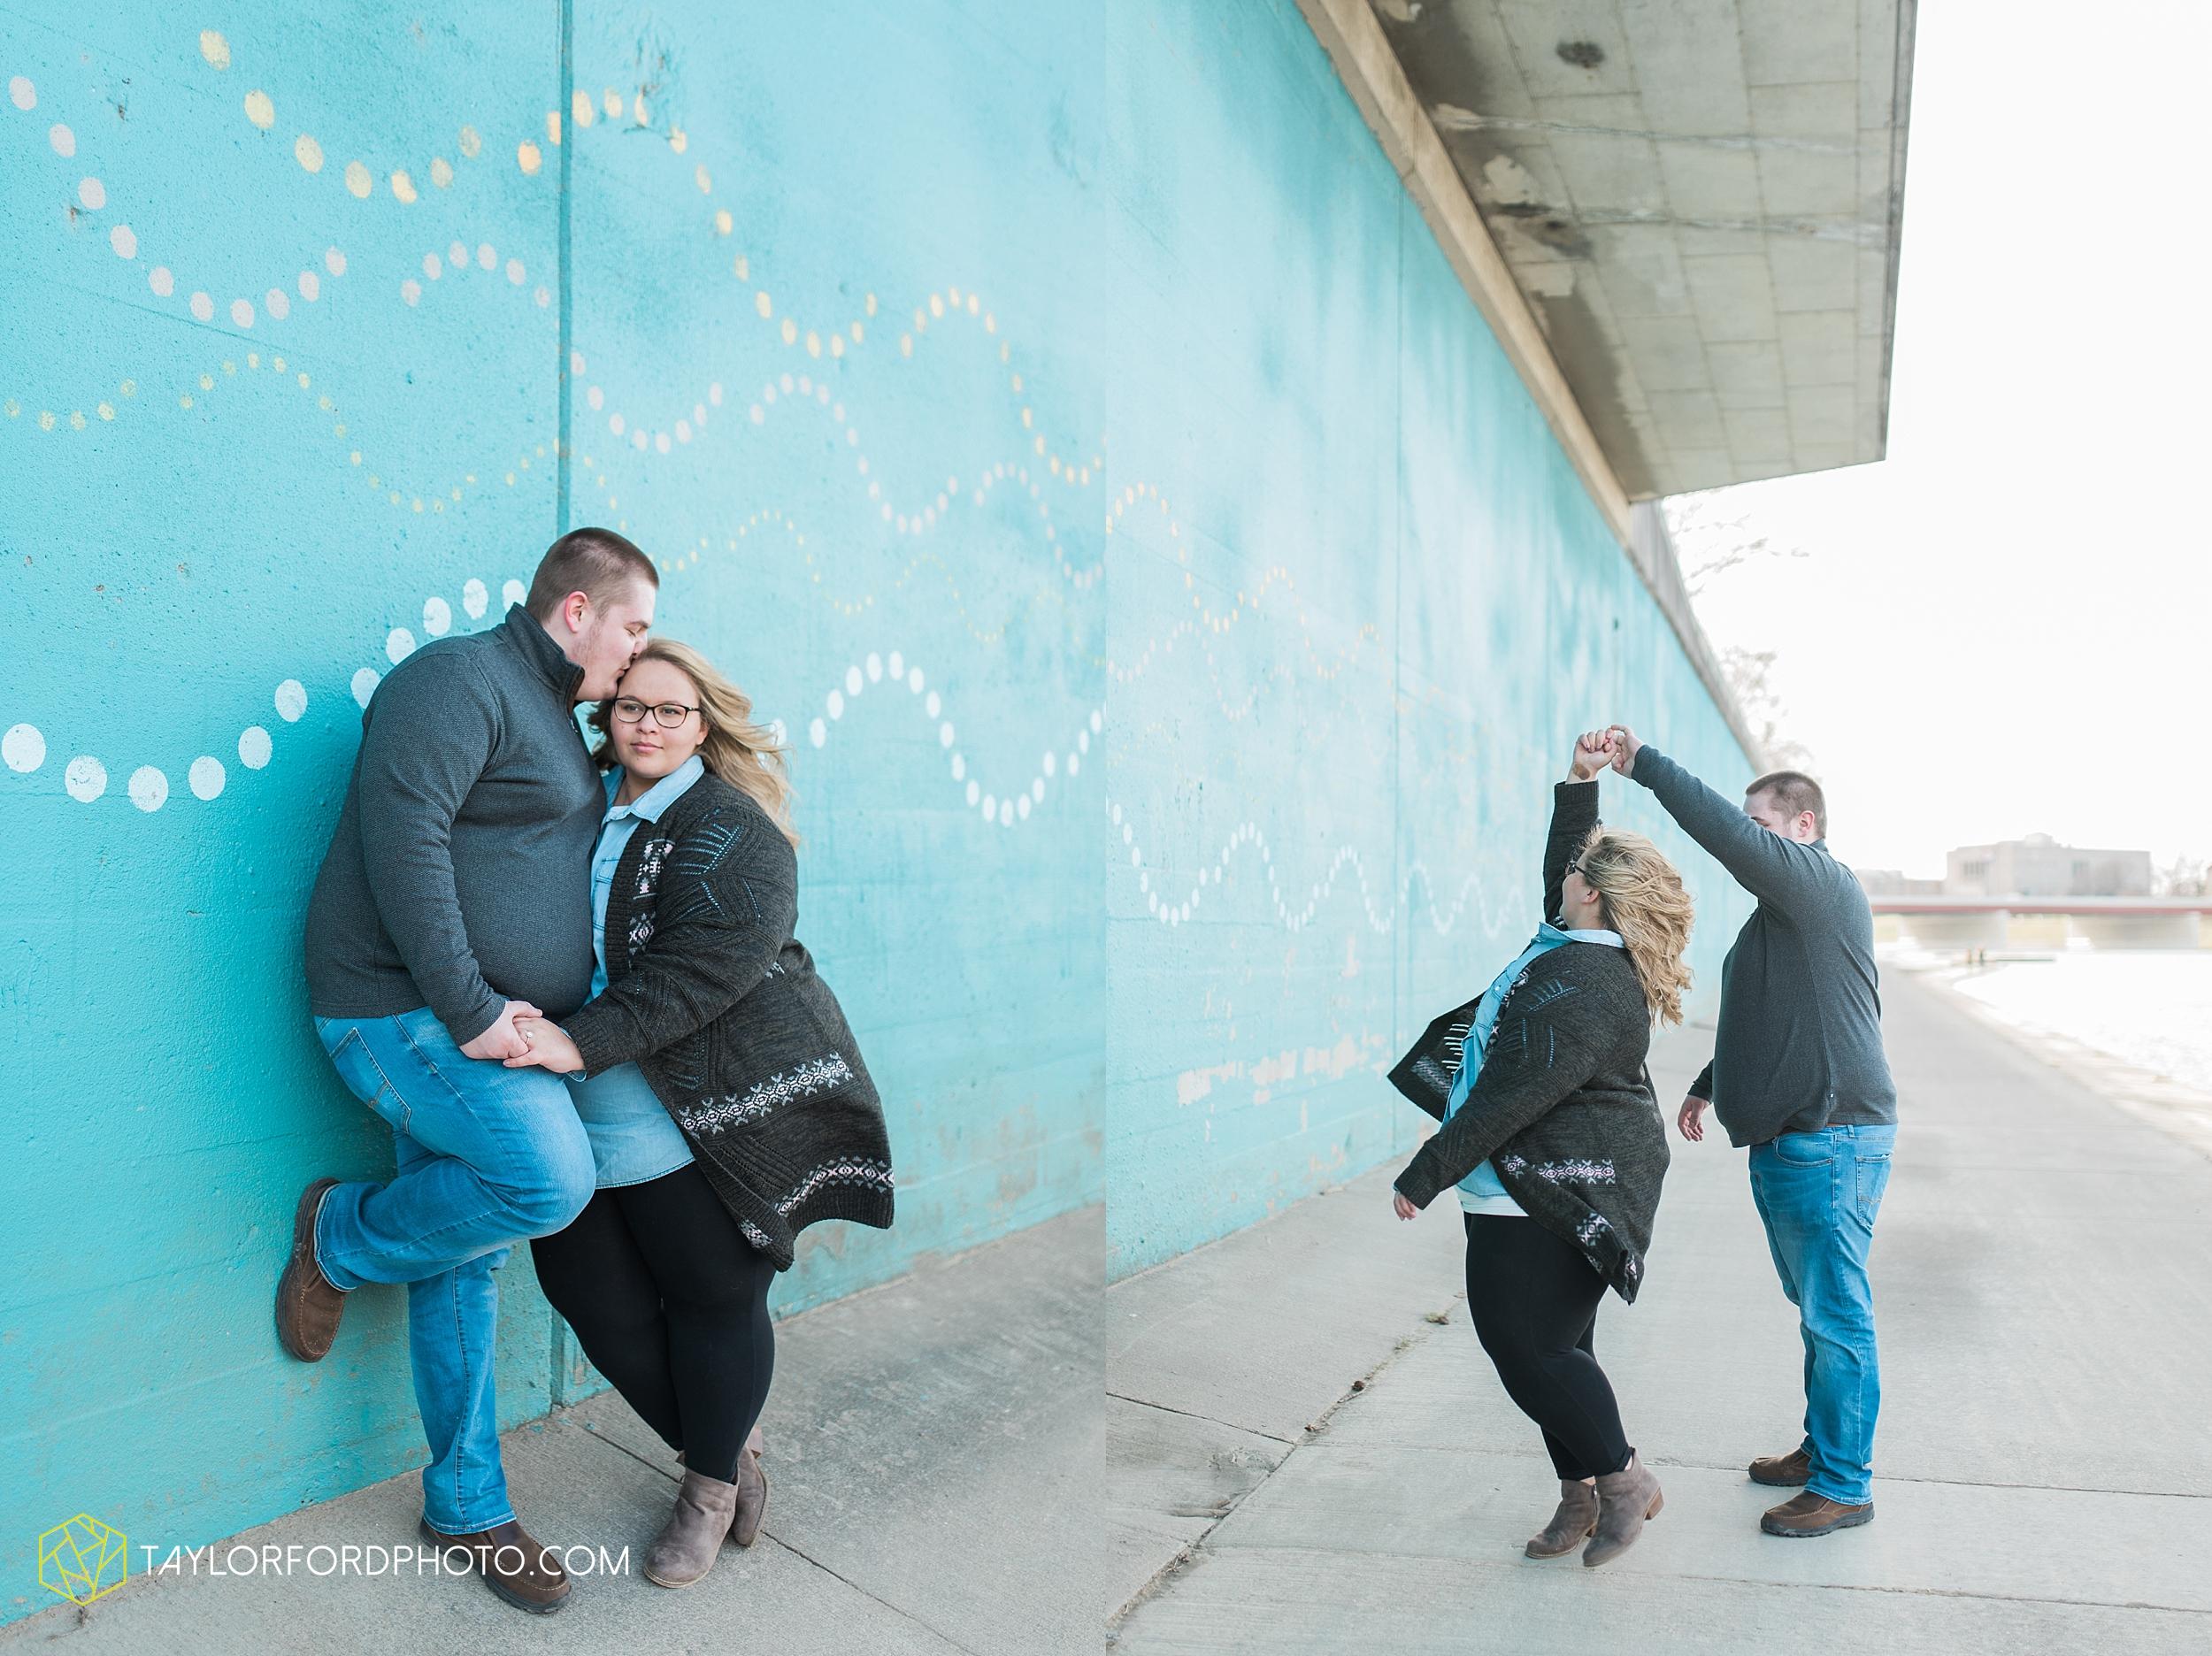 dayton-ohio-engagement-photographer-oregon-district-riverfront-metro-Taylor-Ford-Photography_6468.jpg